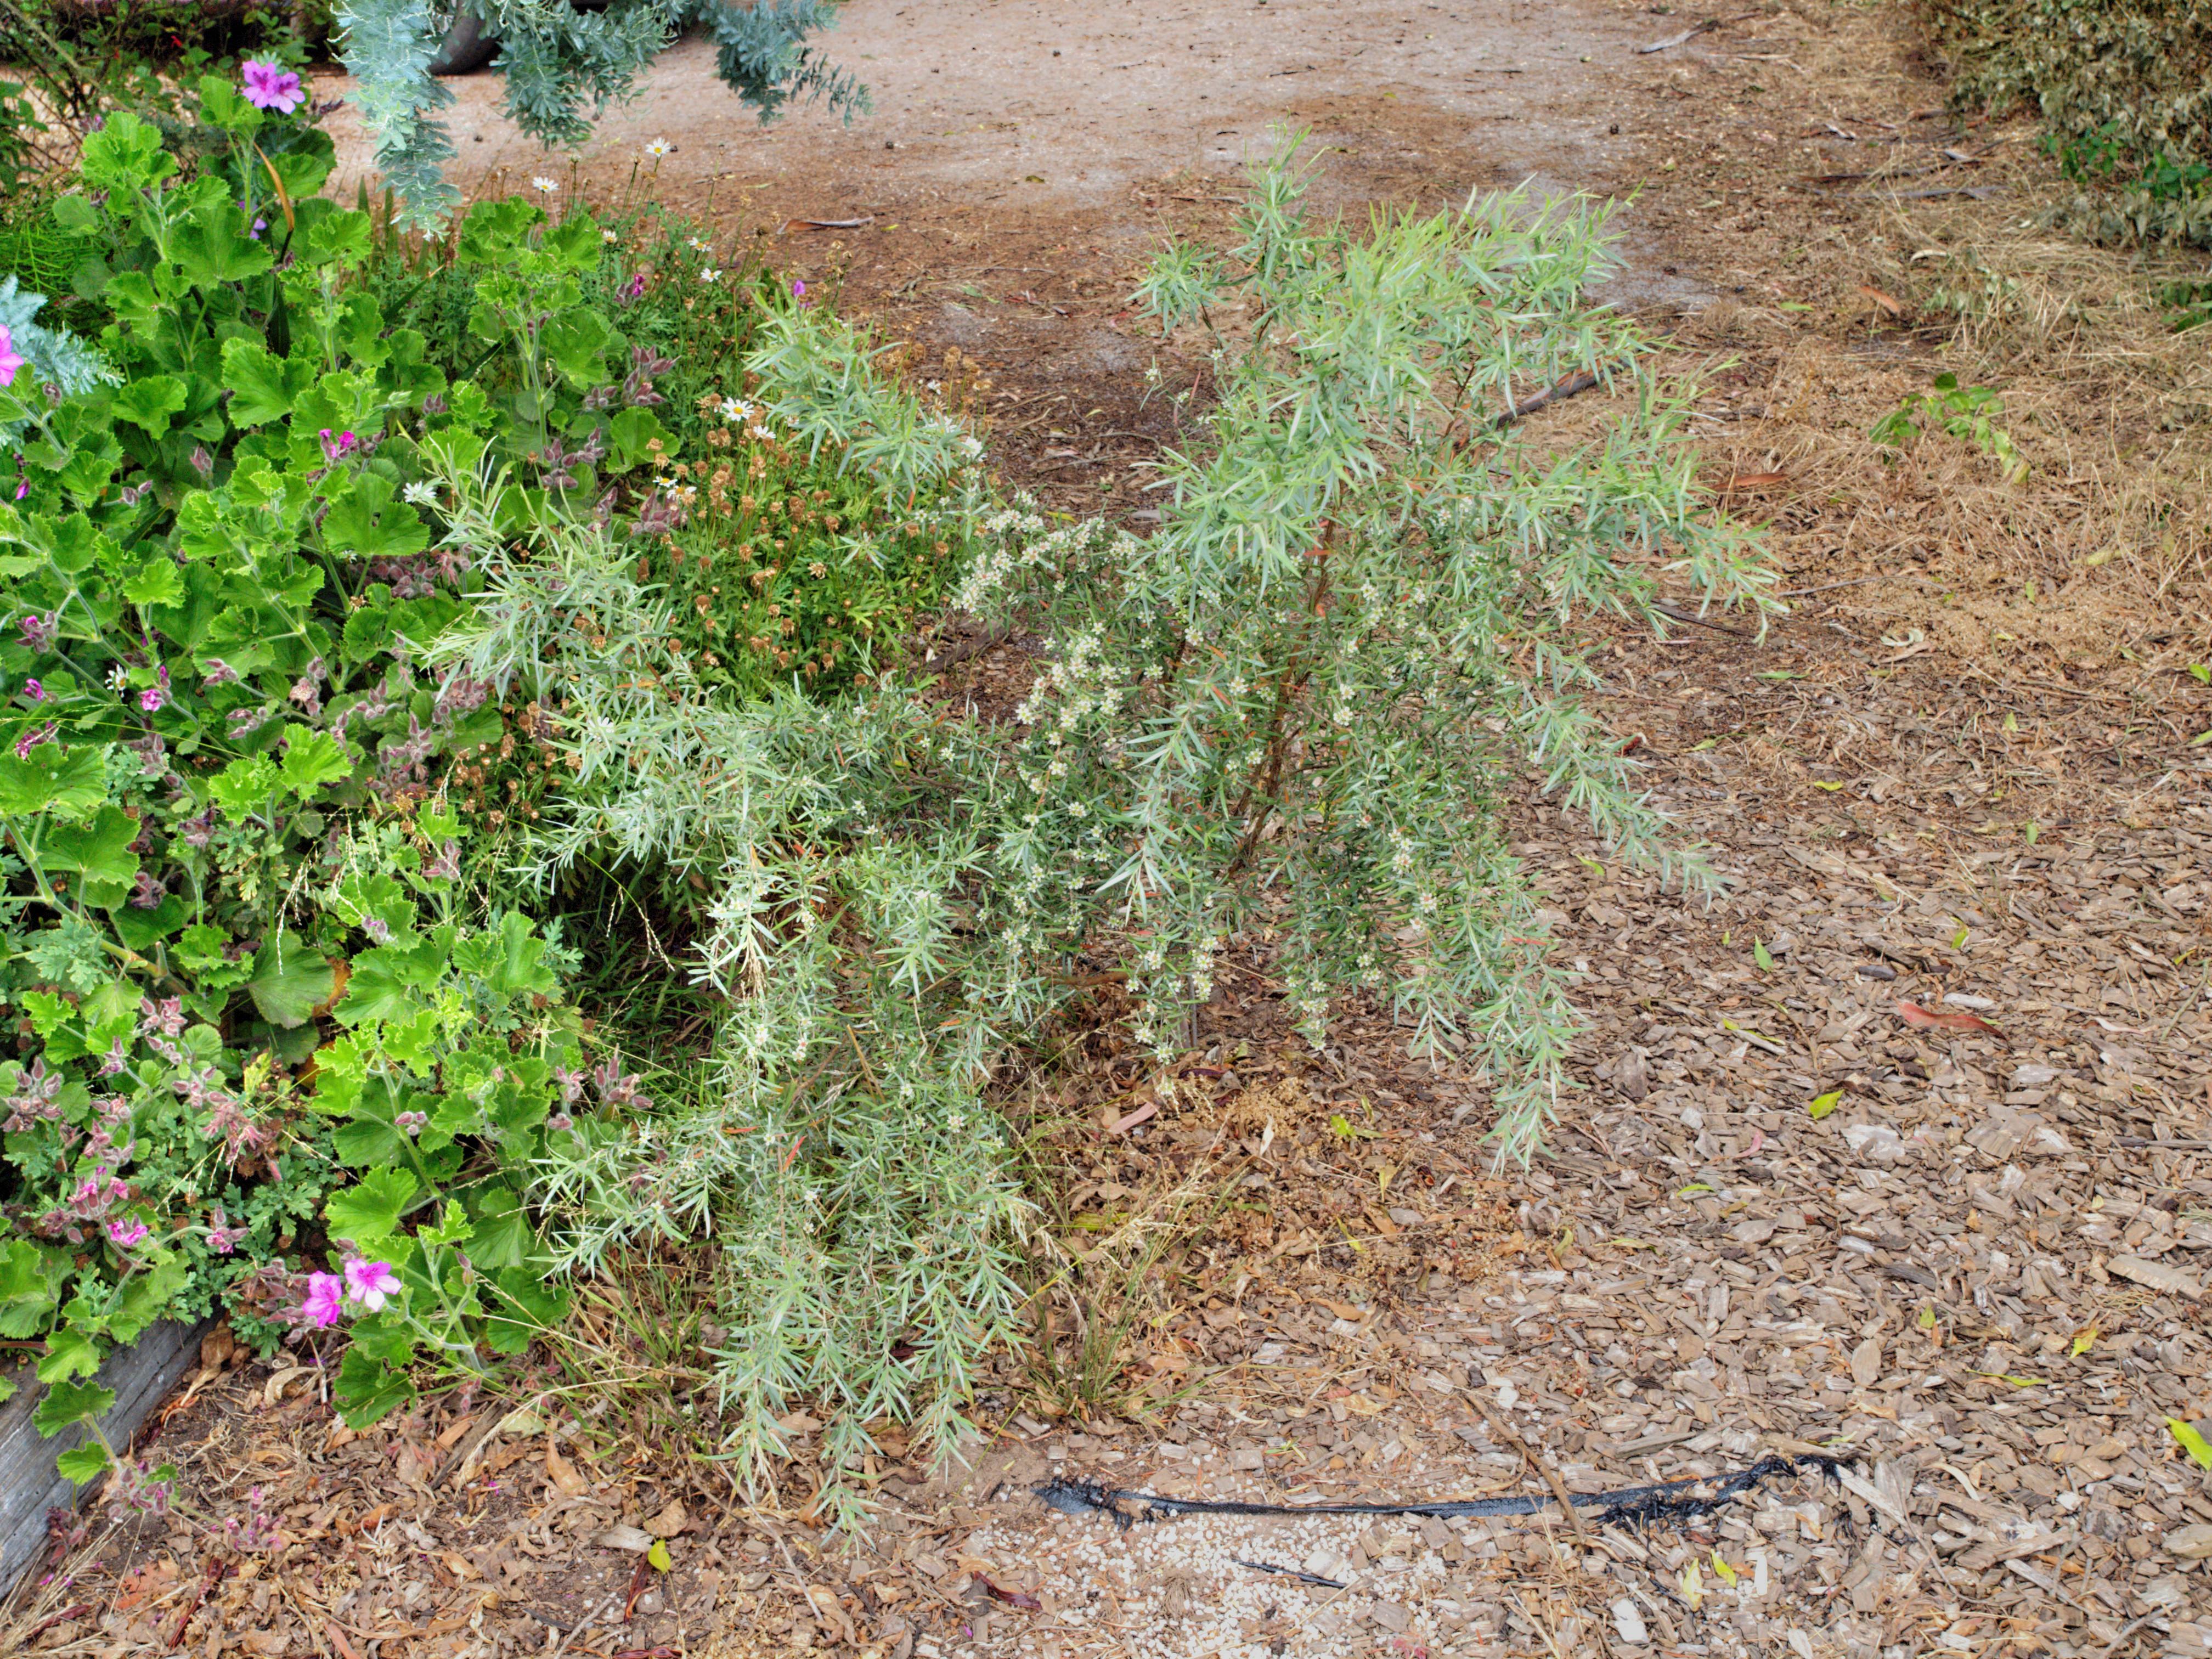 Leptospermum-brachyandrum-2.jpeg